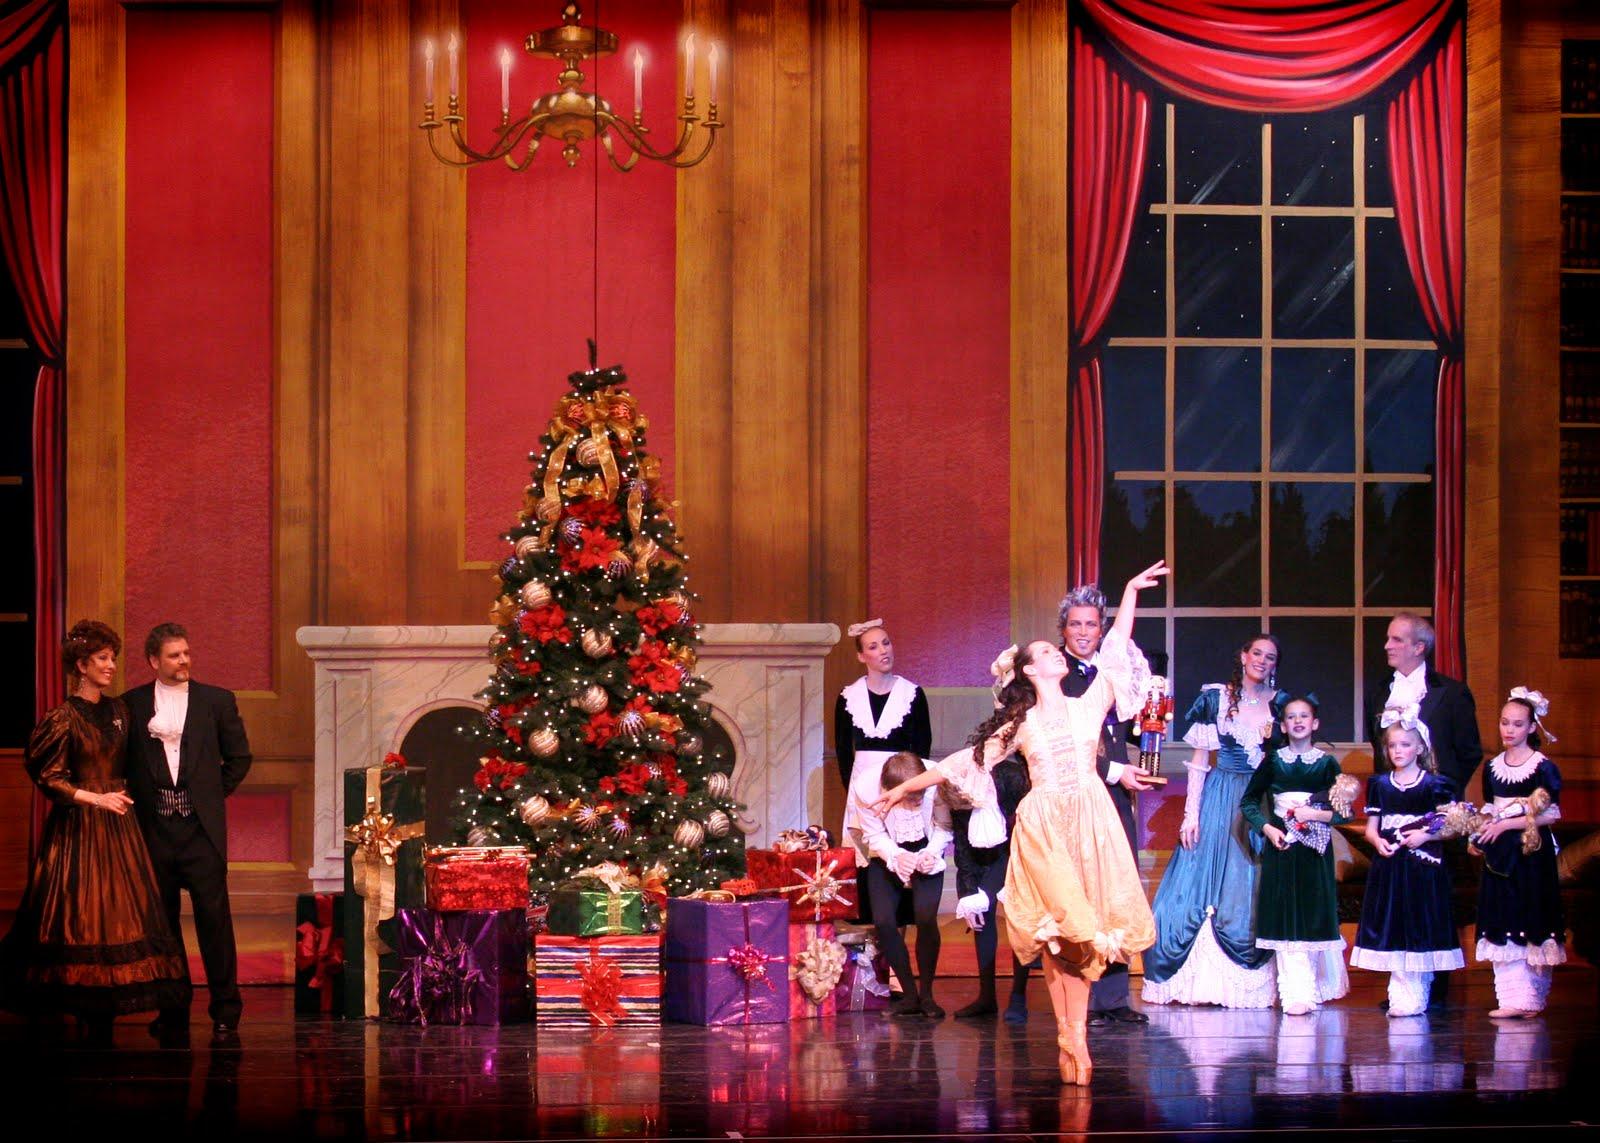 AVA Nutcracker 03 RGB A.V.A. Ballet Theatre's